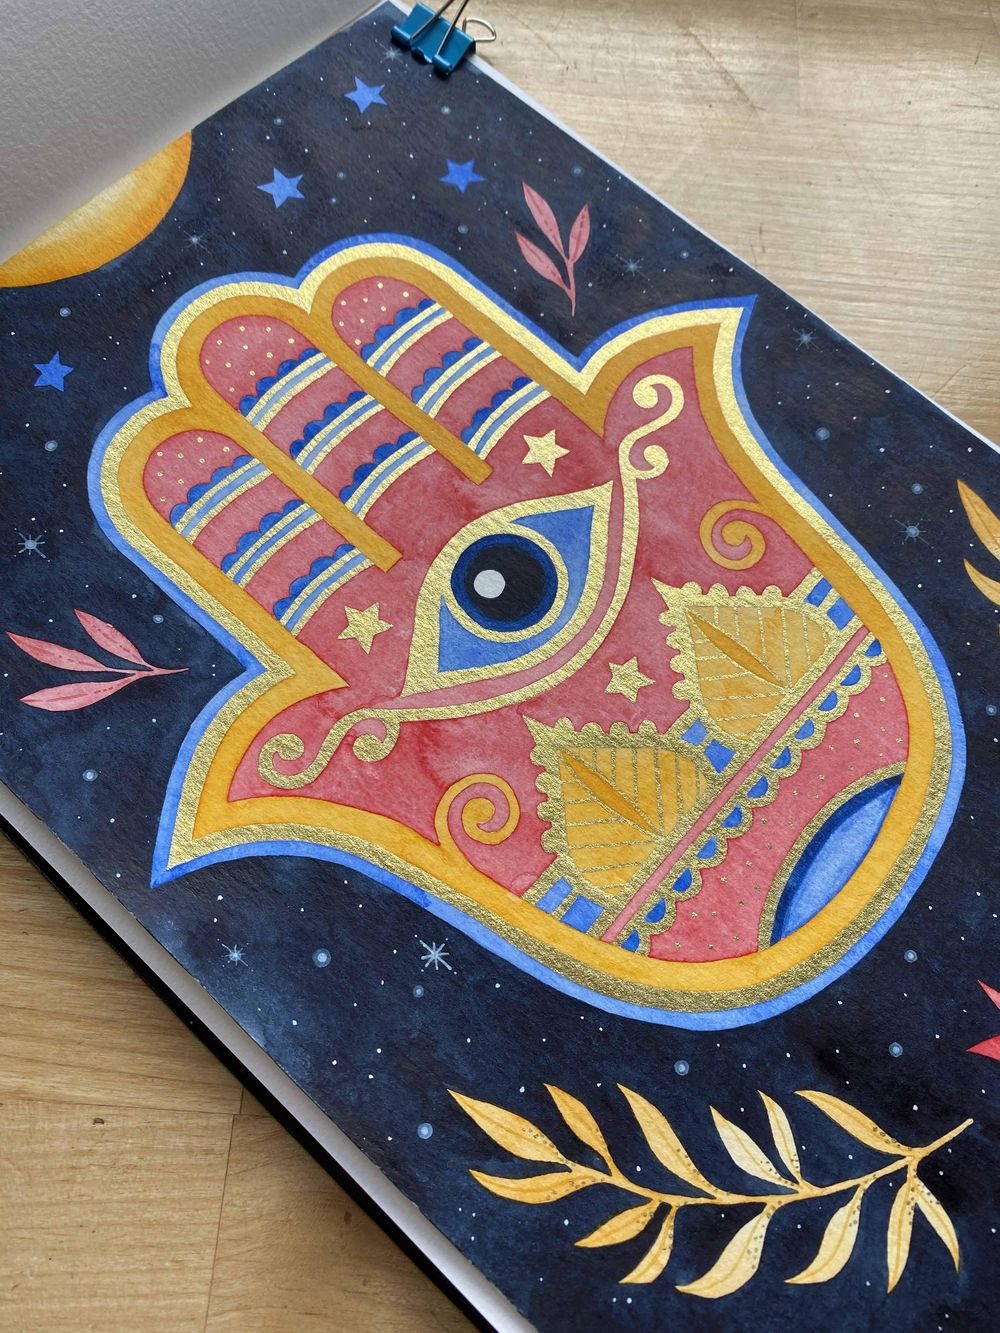 Hamsa Hand - image 3 - student project